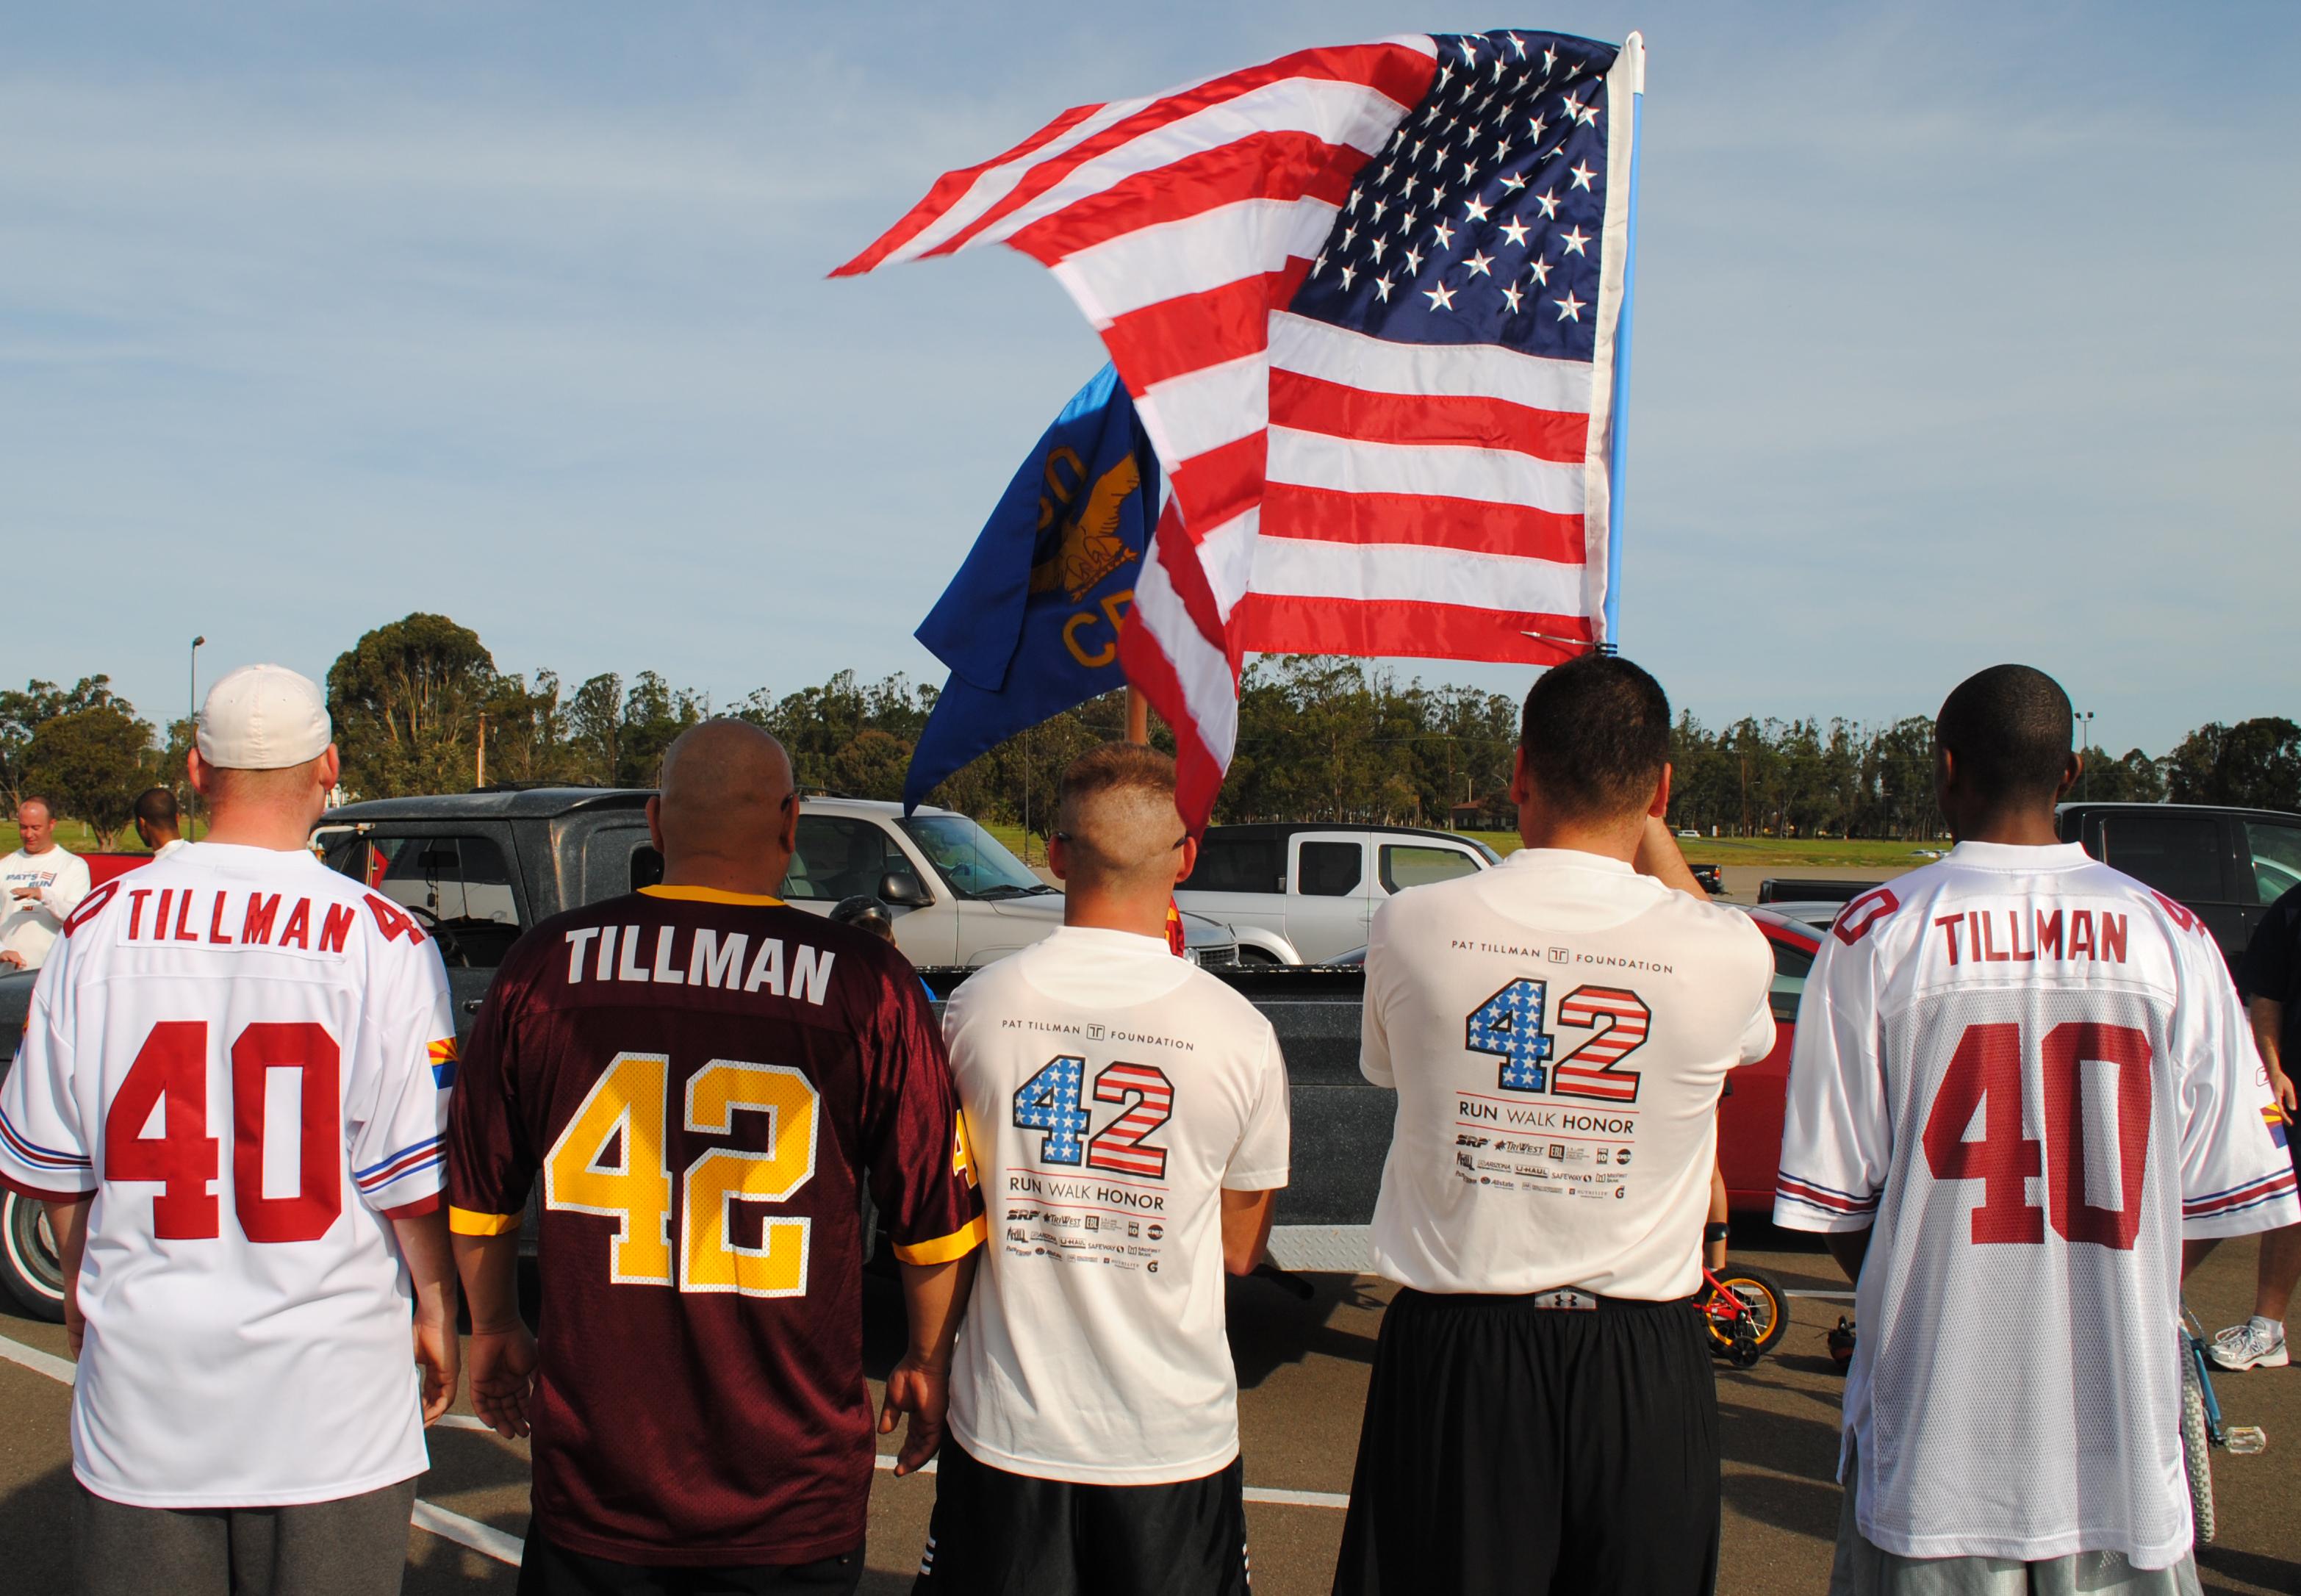 new arrival ced2a ffce1 CES Airmen run in remembrance of Pat Tillman > Vandenberg ...